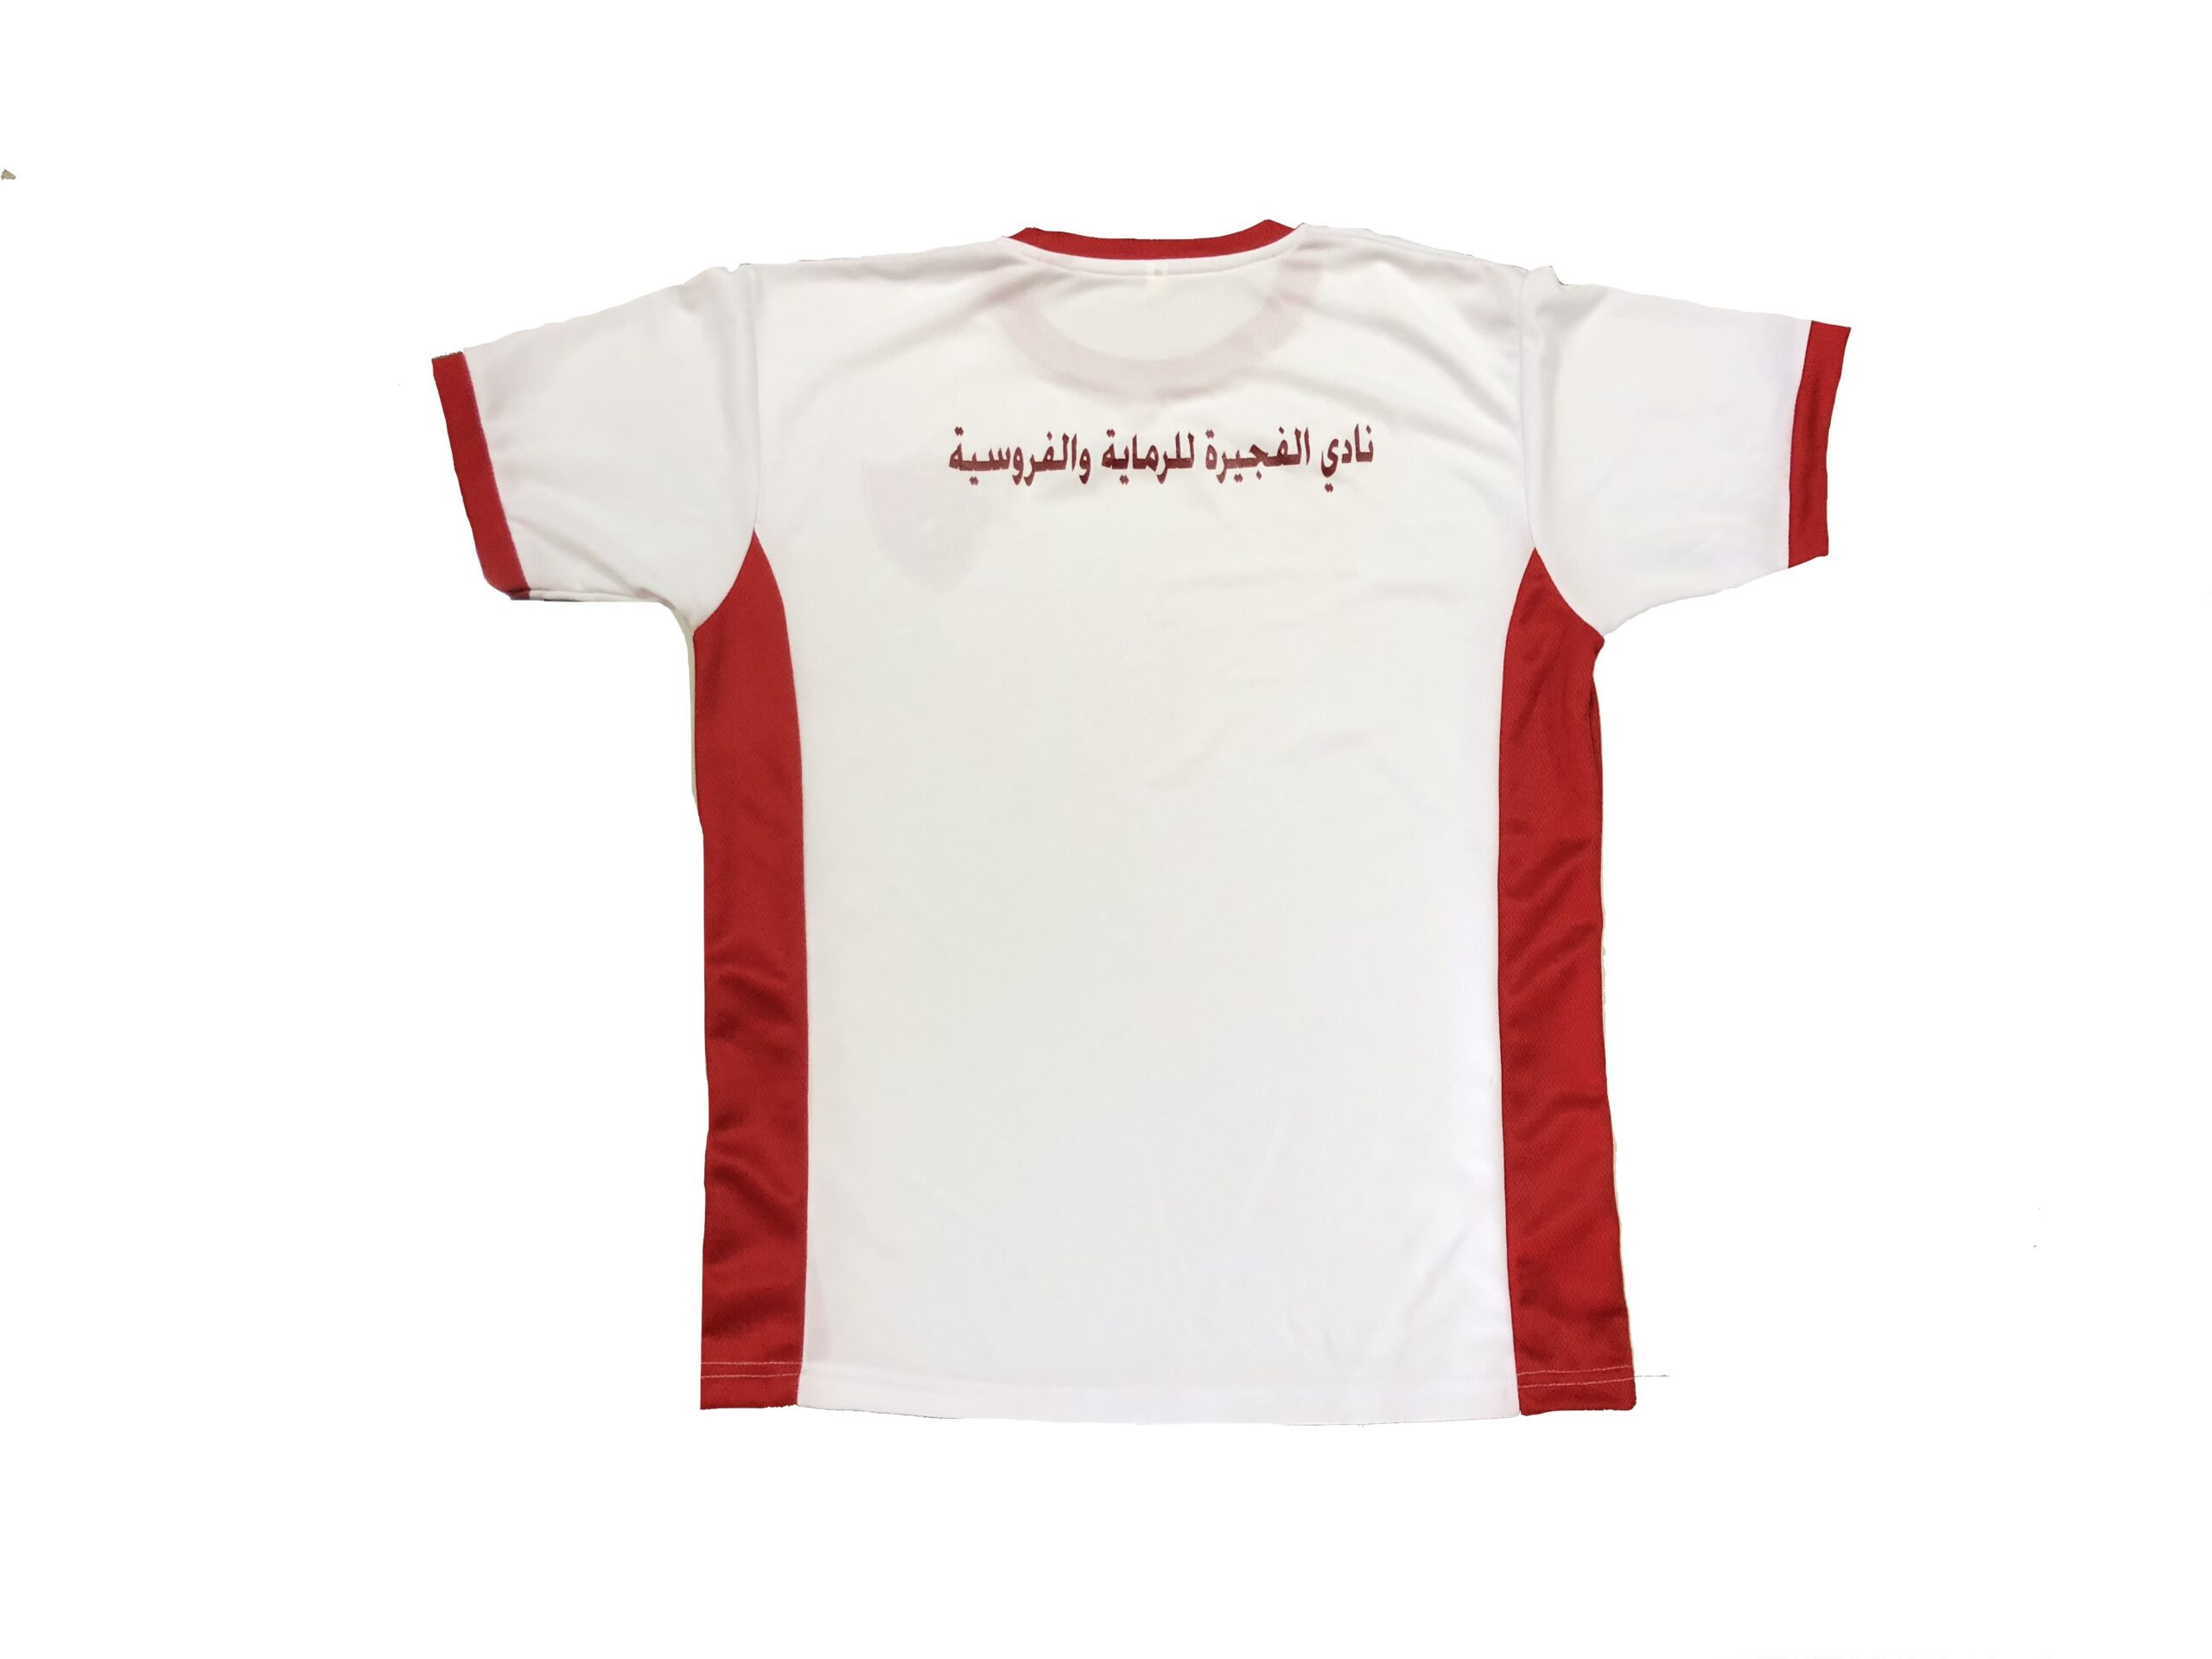 Sports T-shirt backside